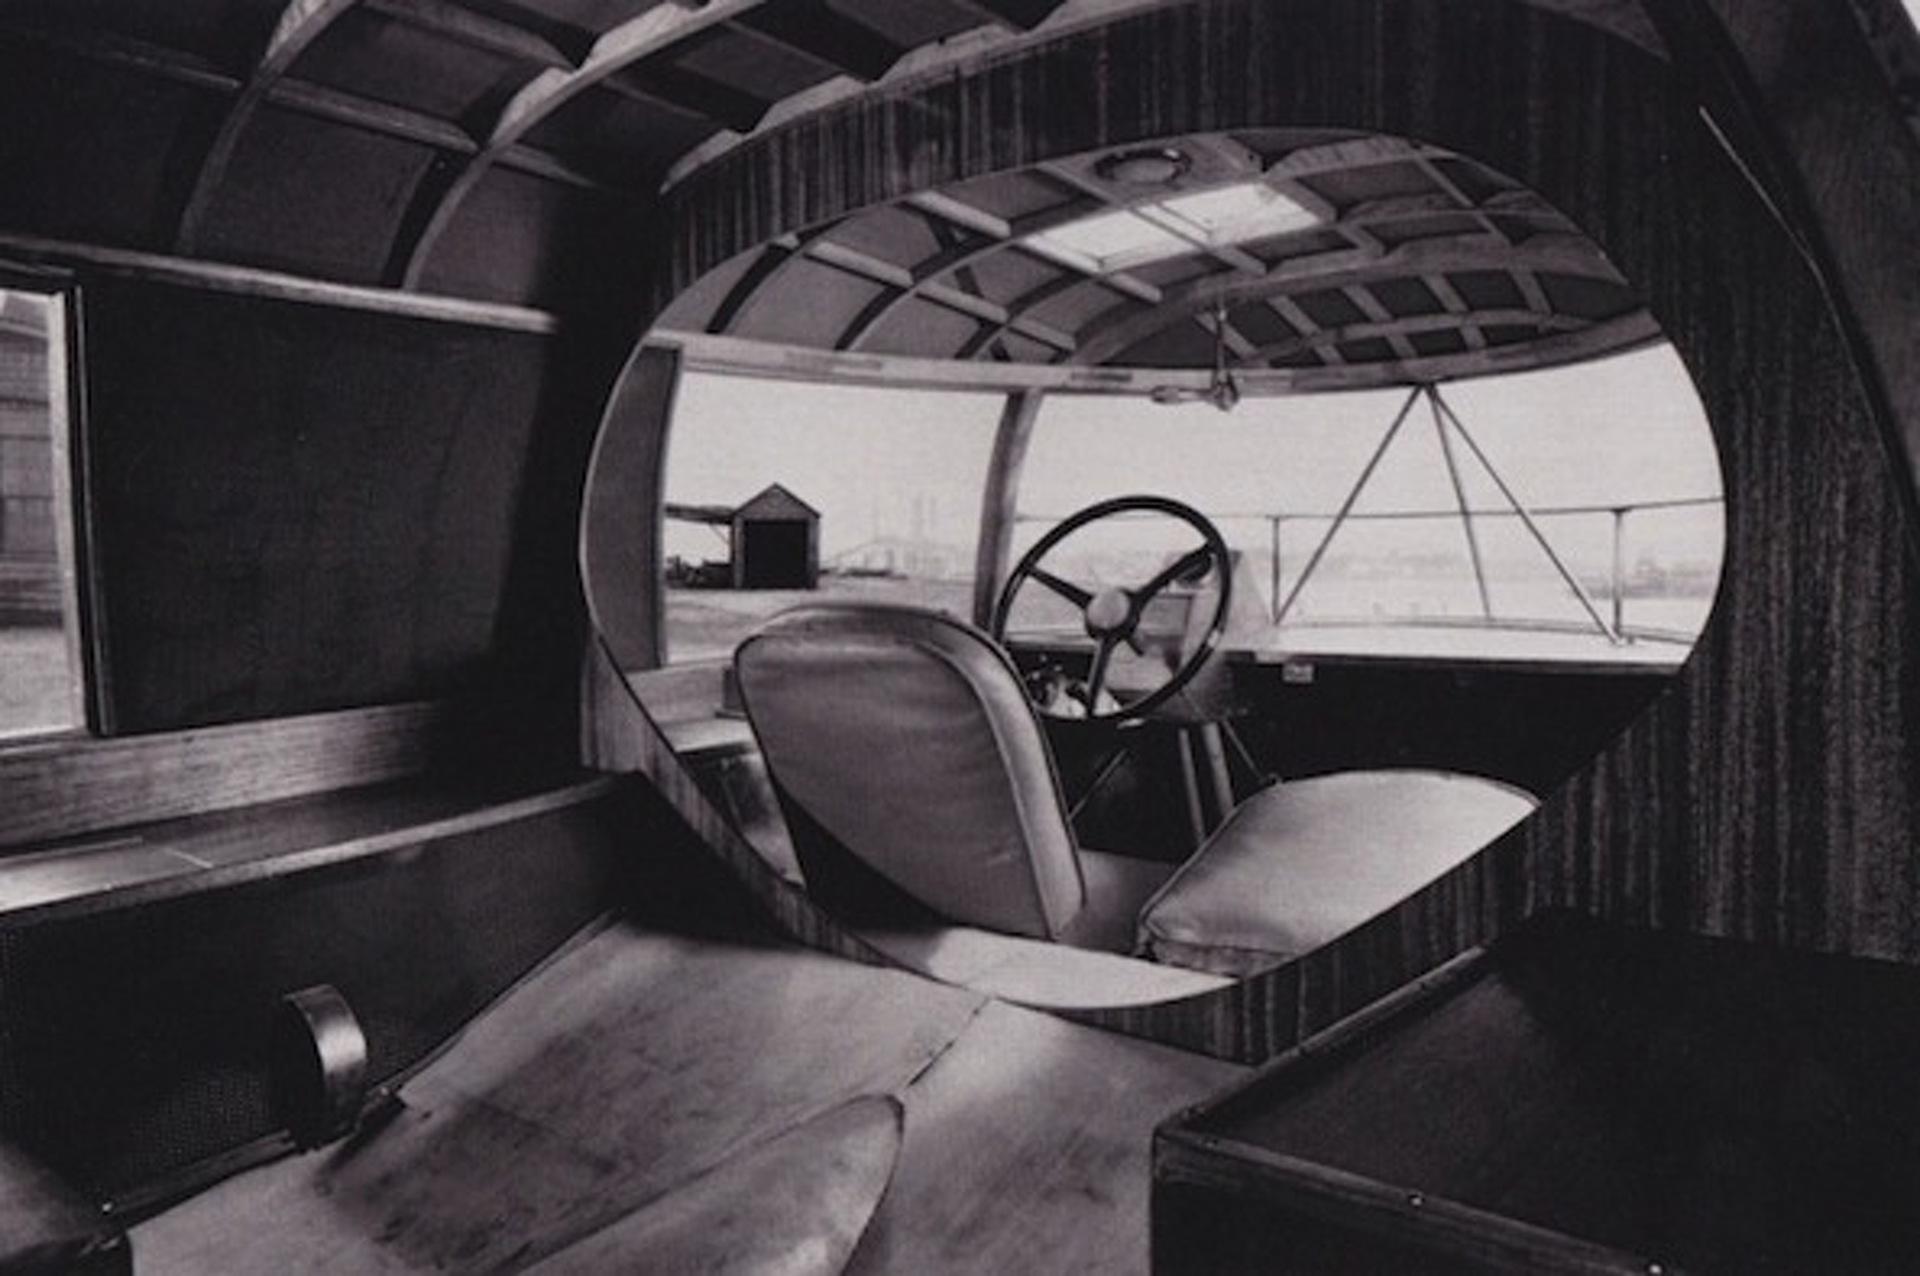 Buckminster Fuller's Dymaxion: A Car as Unconventional as its Creator